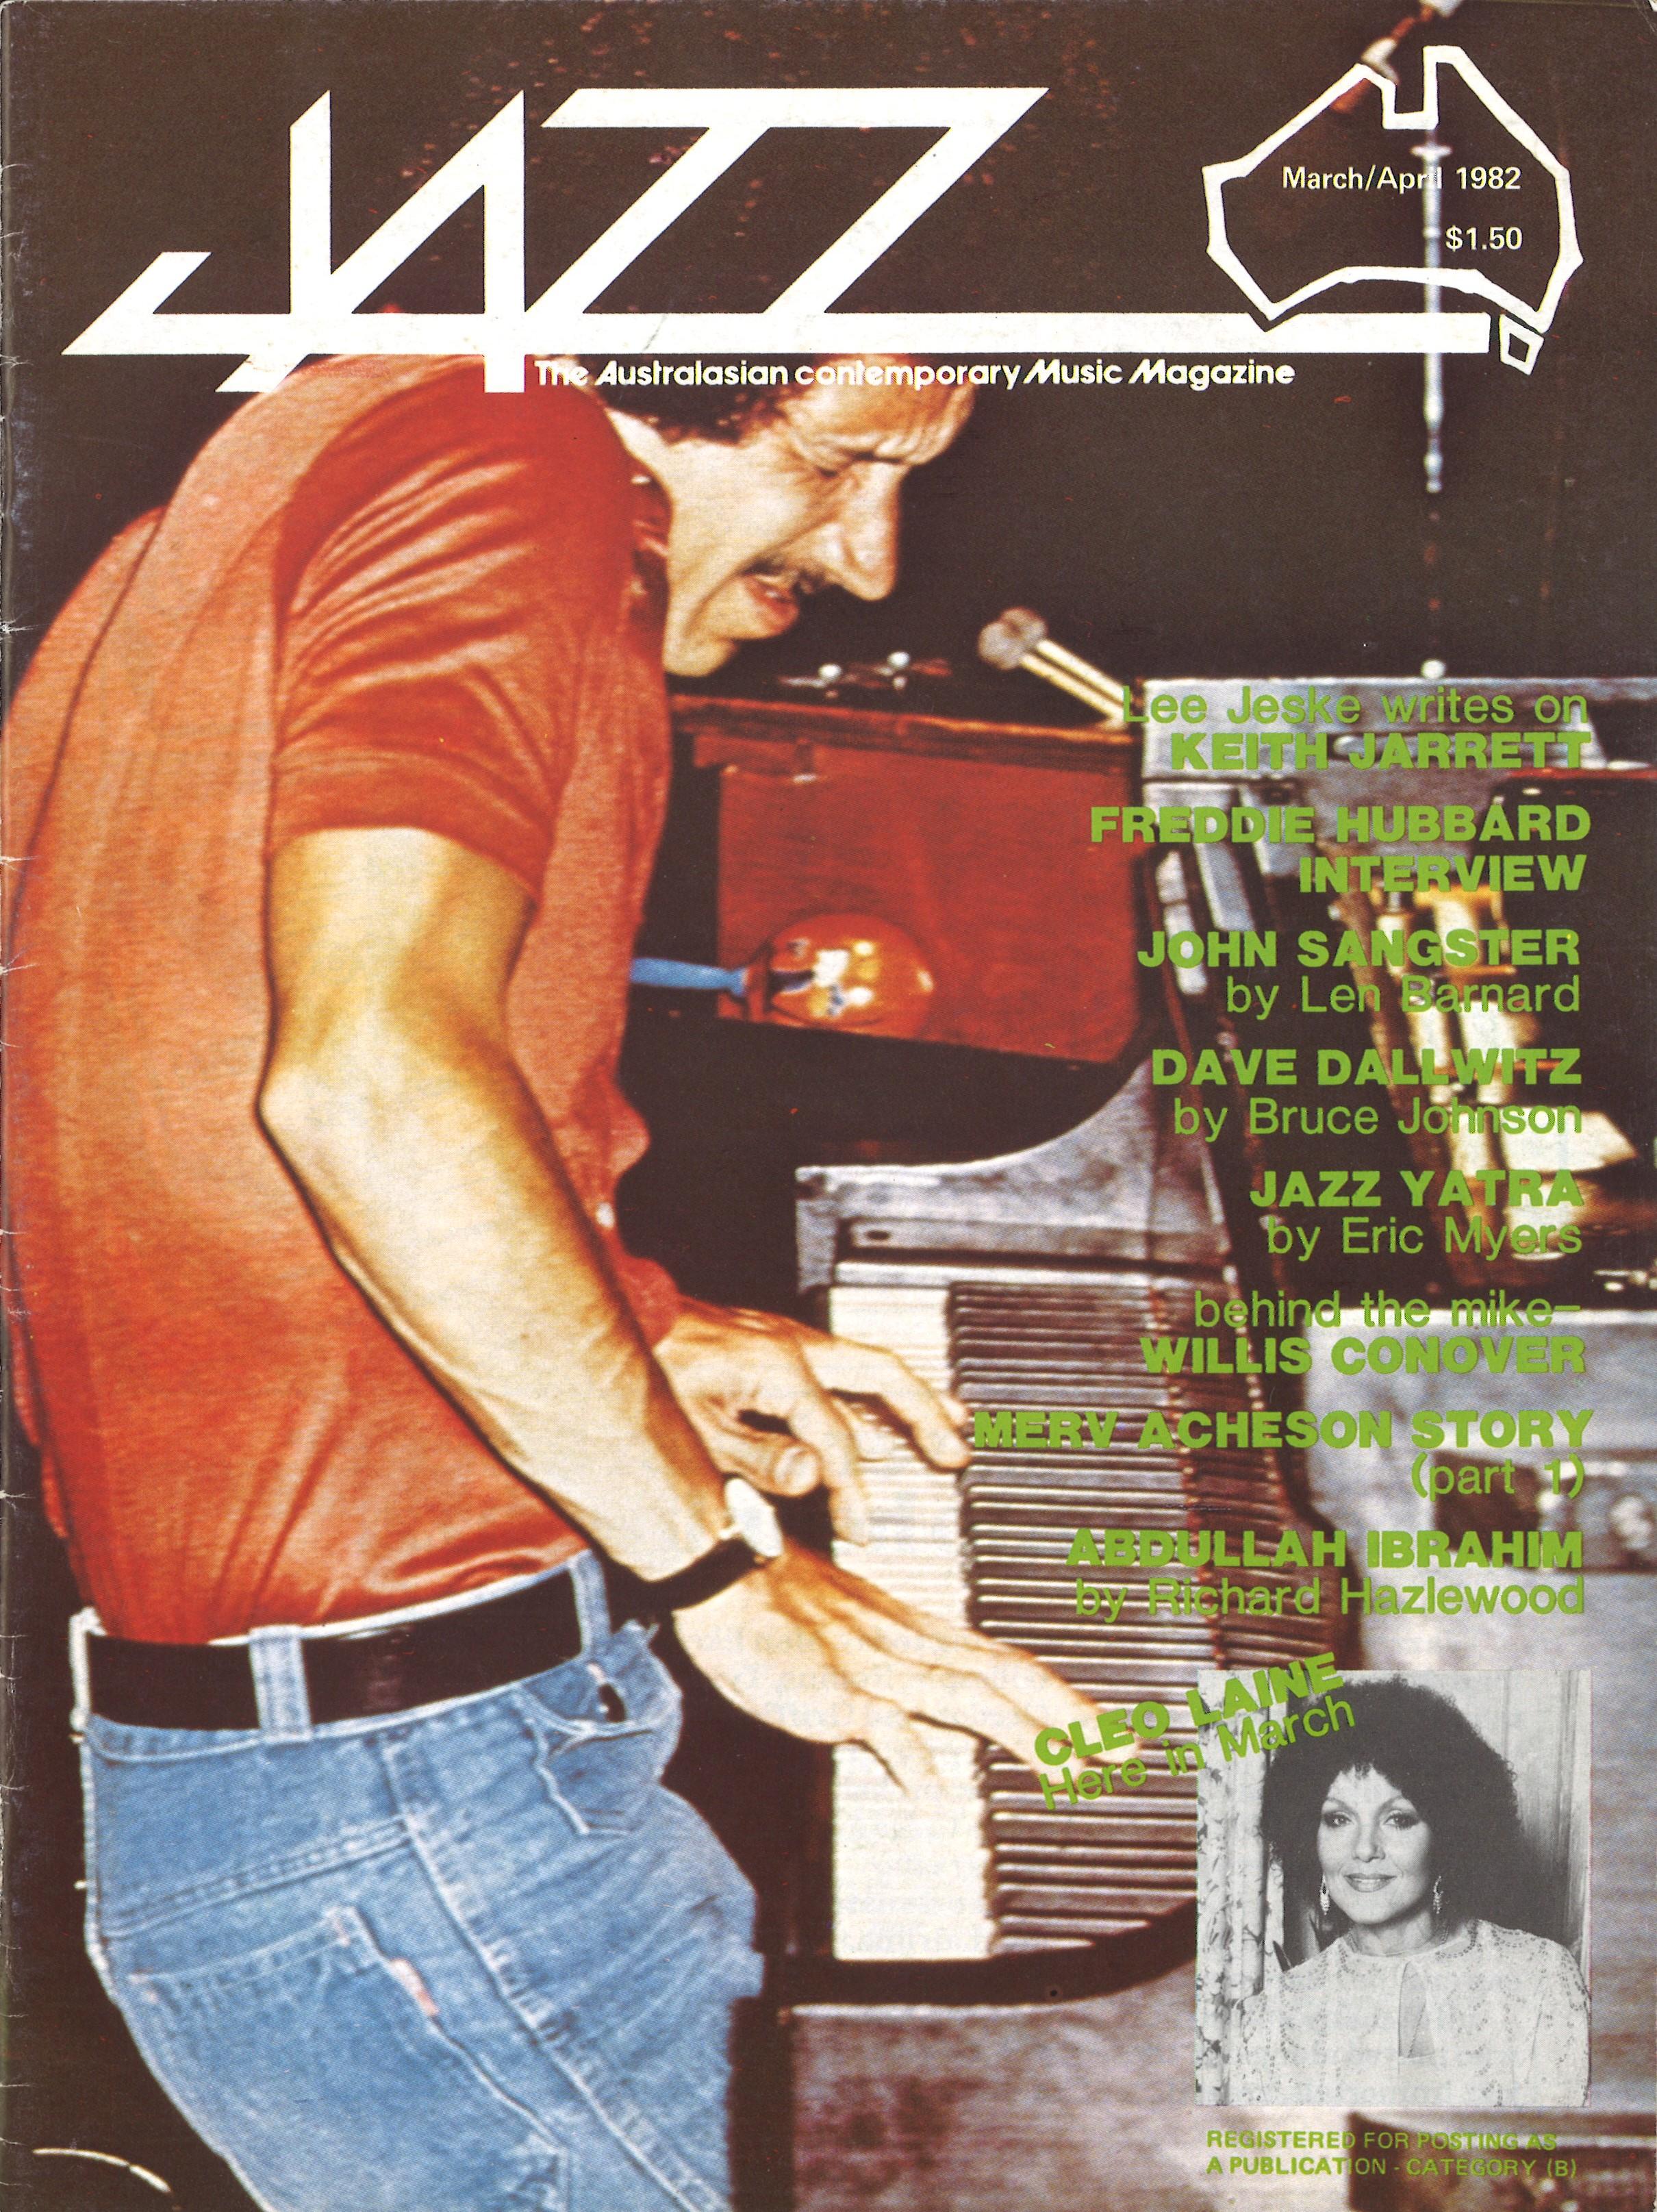 JazzMagazineMarApr82FrontCover.jpg